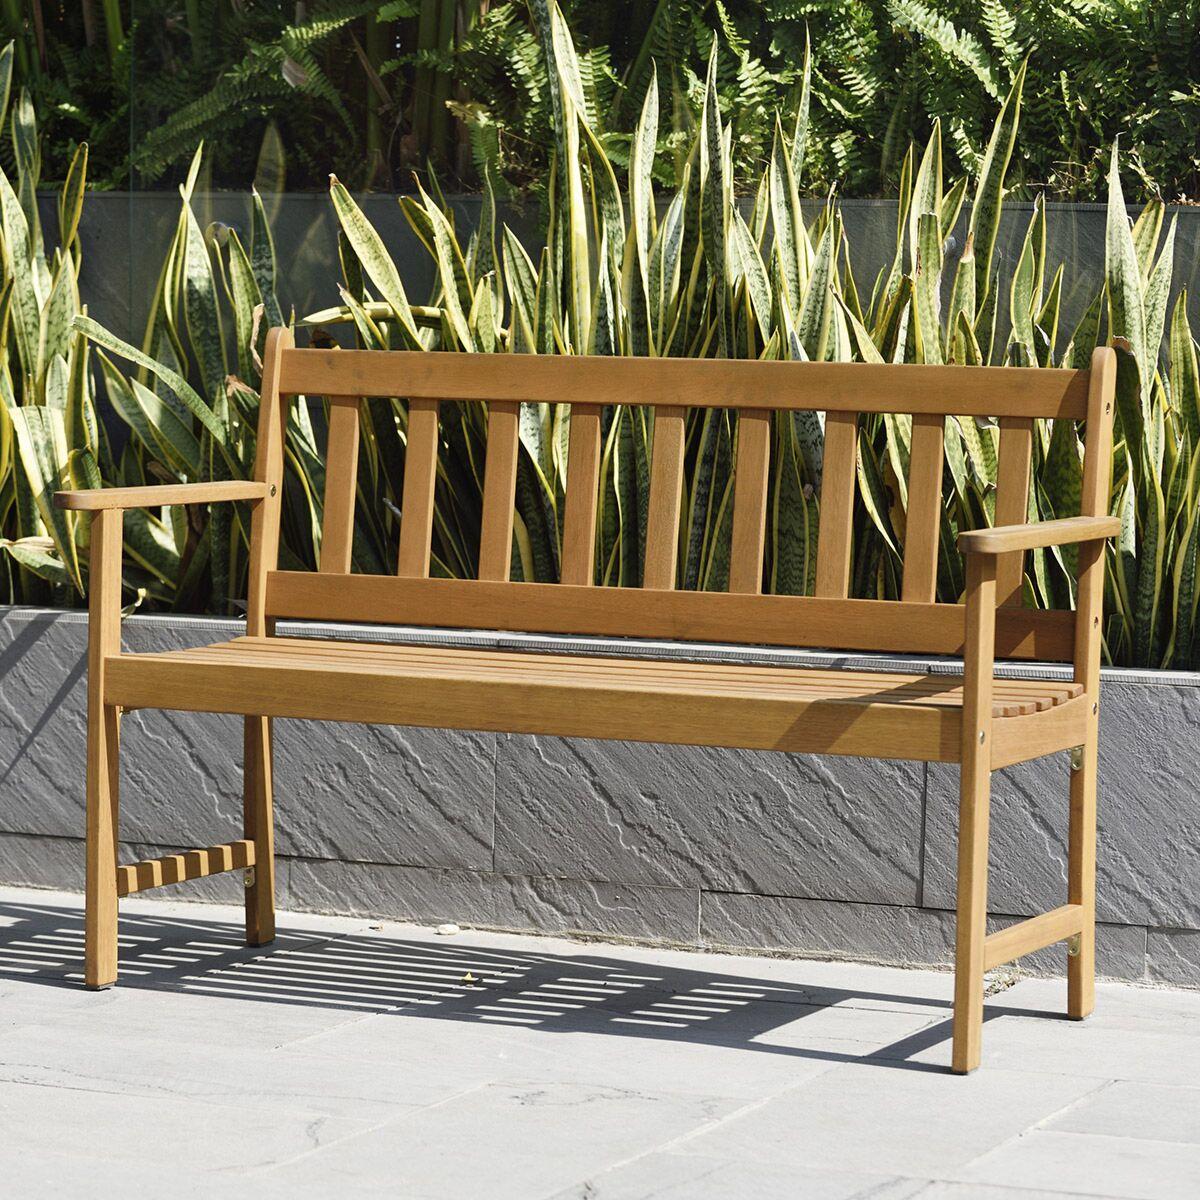 Lamu 2 Seater Eucalyptus FSC Wooden Garden Bench £84.99 Click & Collect, using code @ Robert Dyas